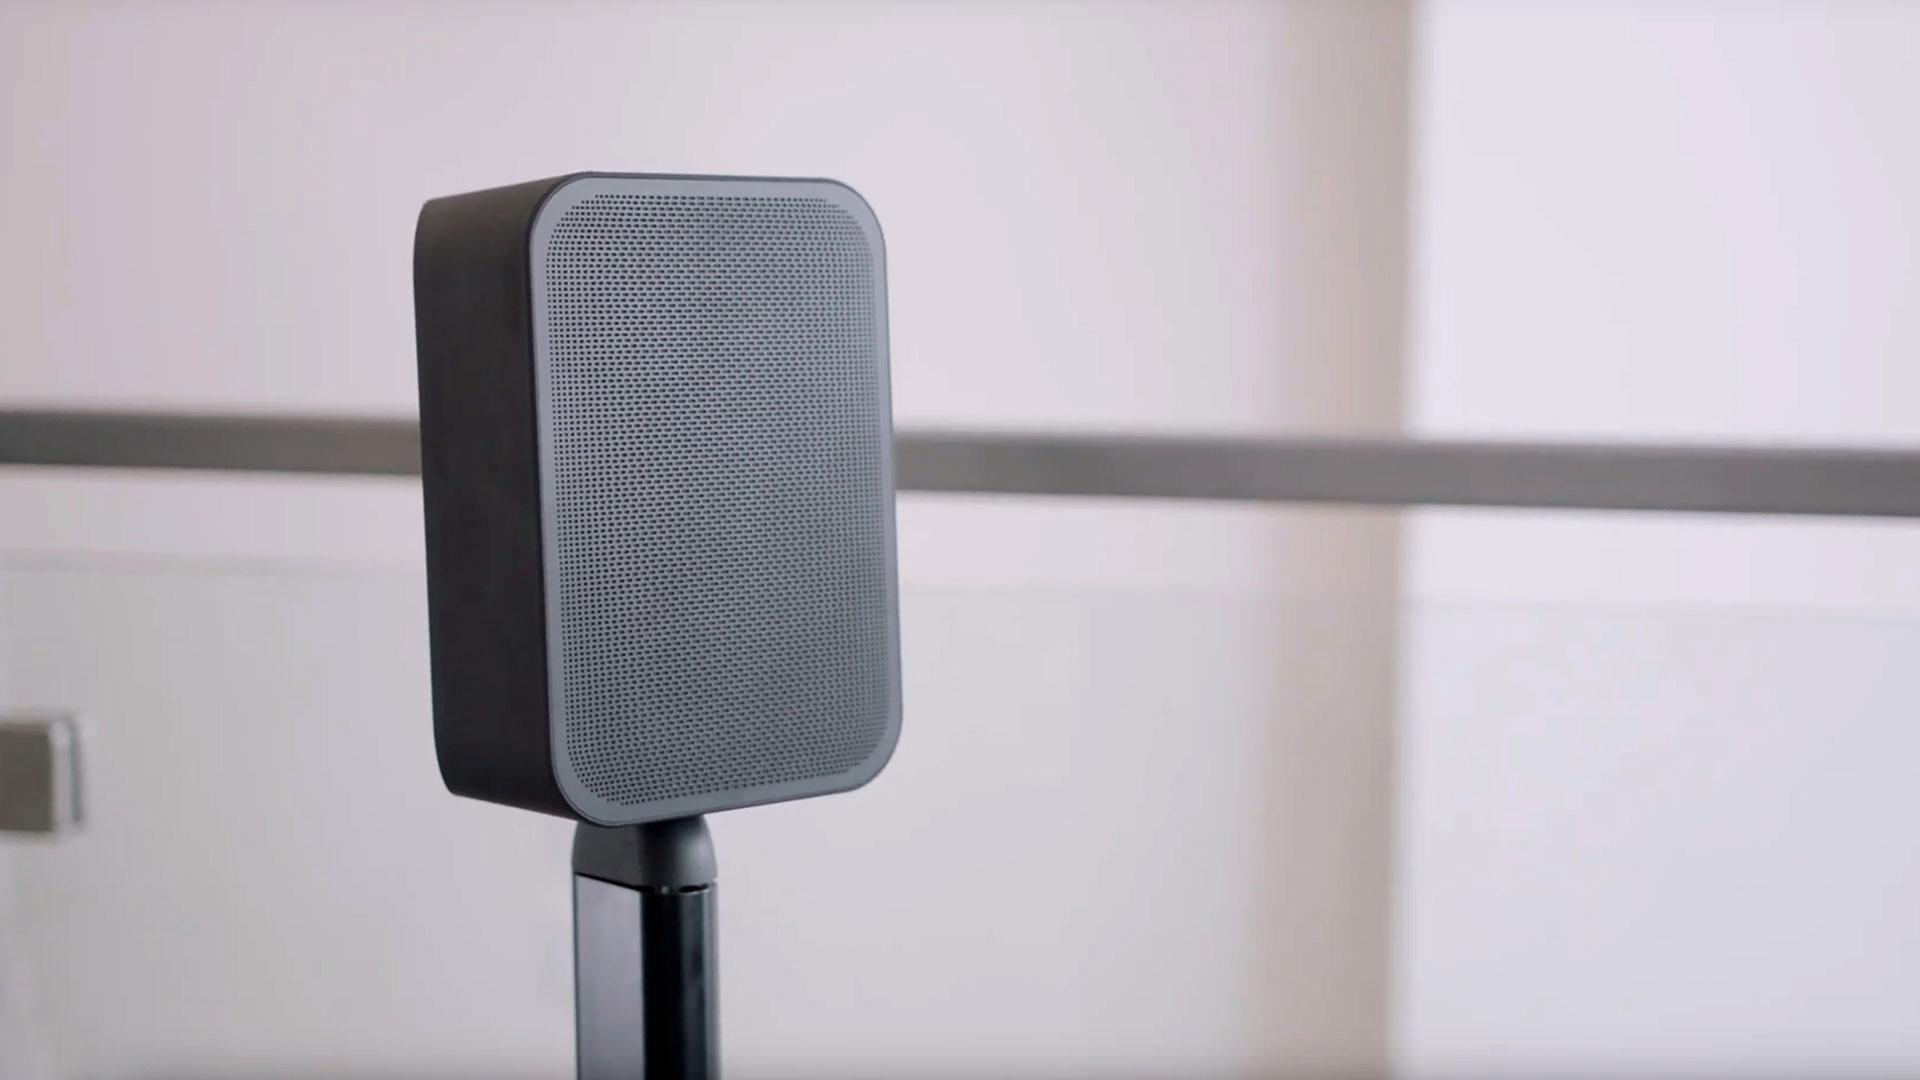 Bluesound PULSE FLEX operating as a surround speaker